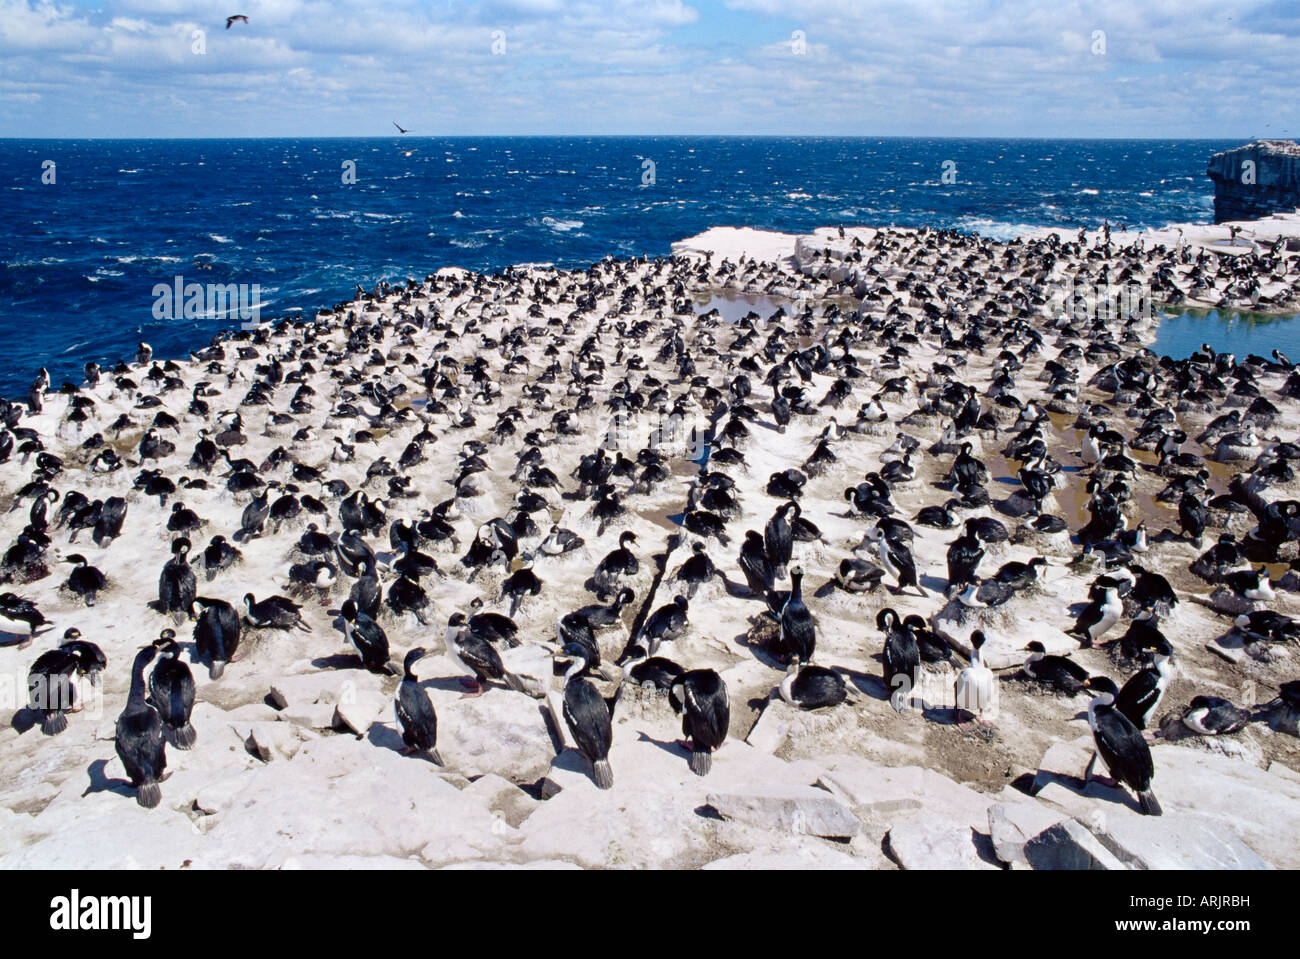 Imperial (king) shags (Phalacrocorax atriceps albiventer), Sea Lion Island, Falkland Islands, South Atlantic, South - Stock Image